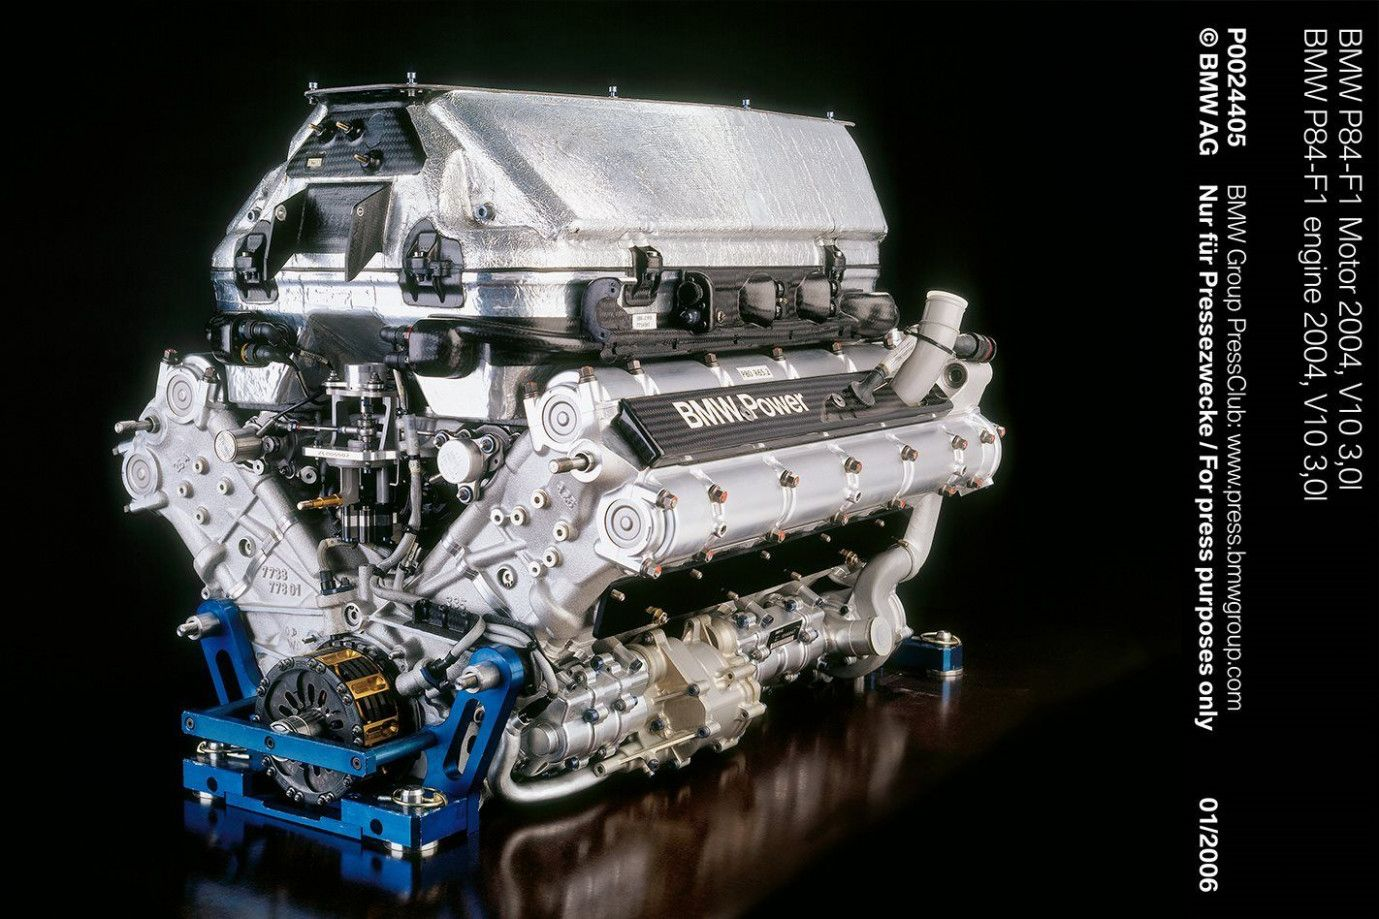 7 Image 2020 Ferrari F1 Engine Specs In 2020 Living In Car Ferrari F1 Car Decorations Diy